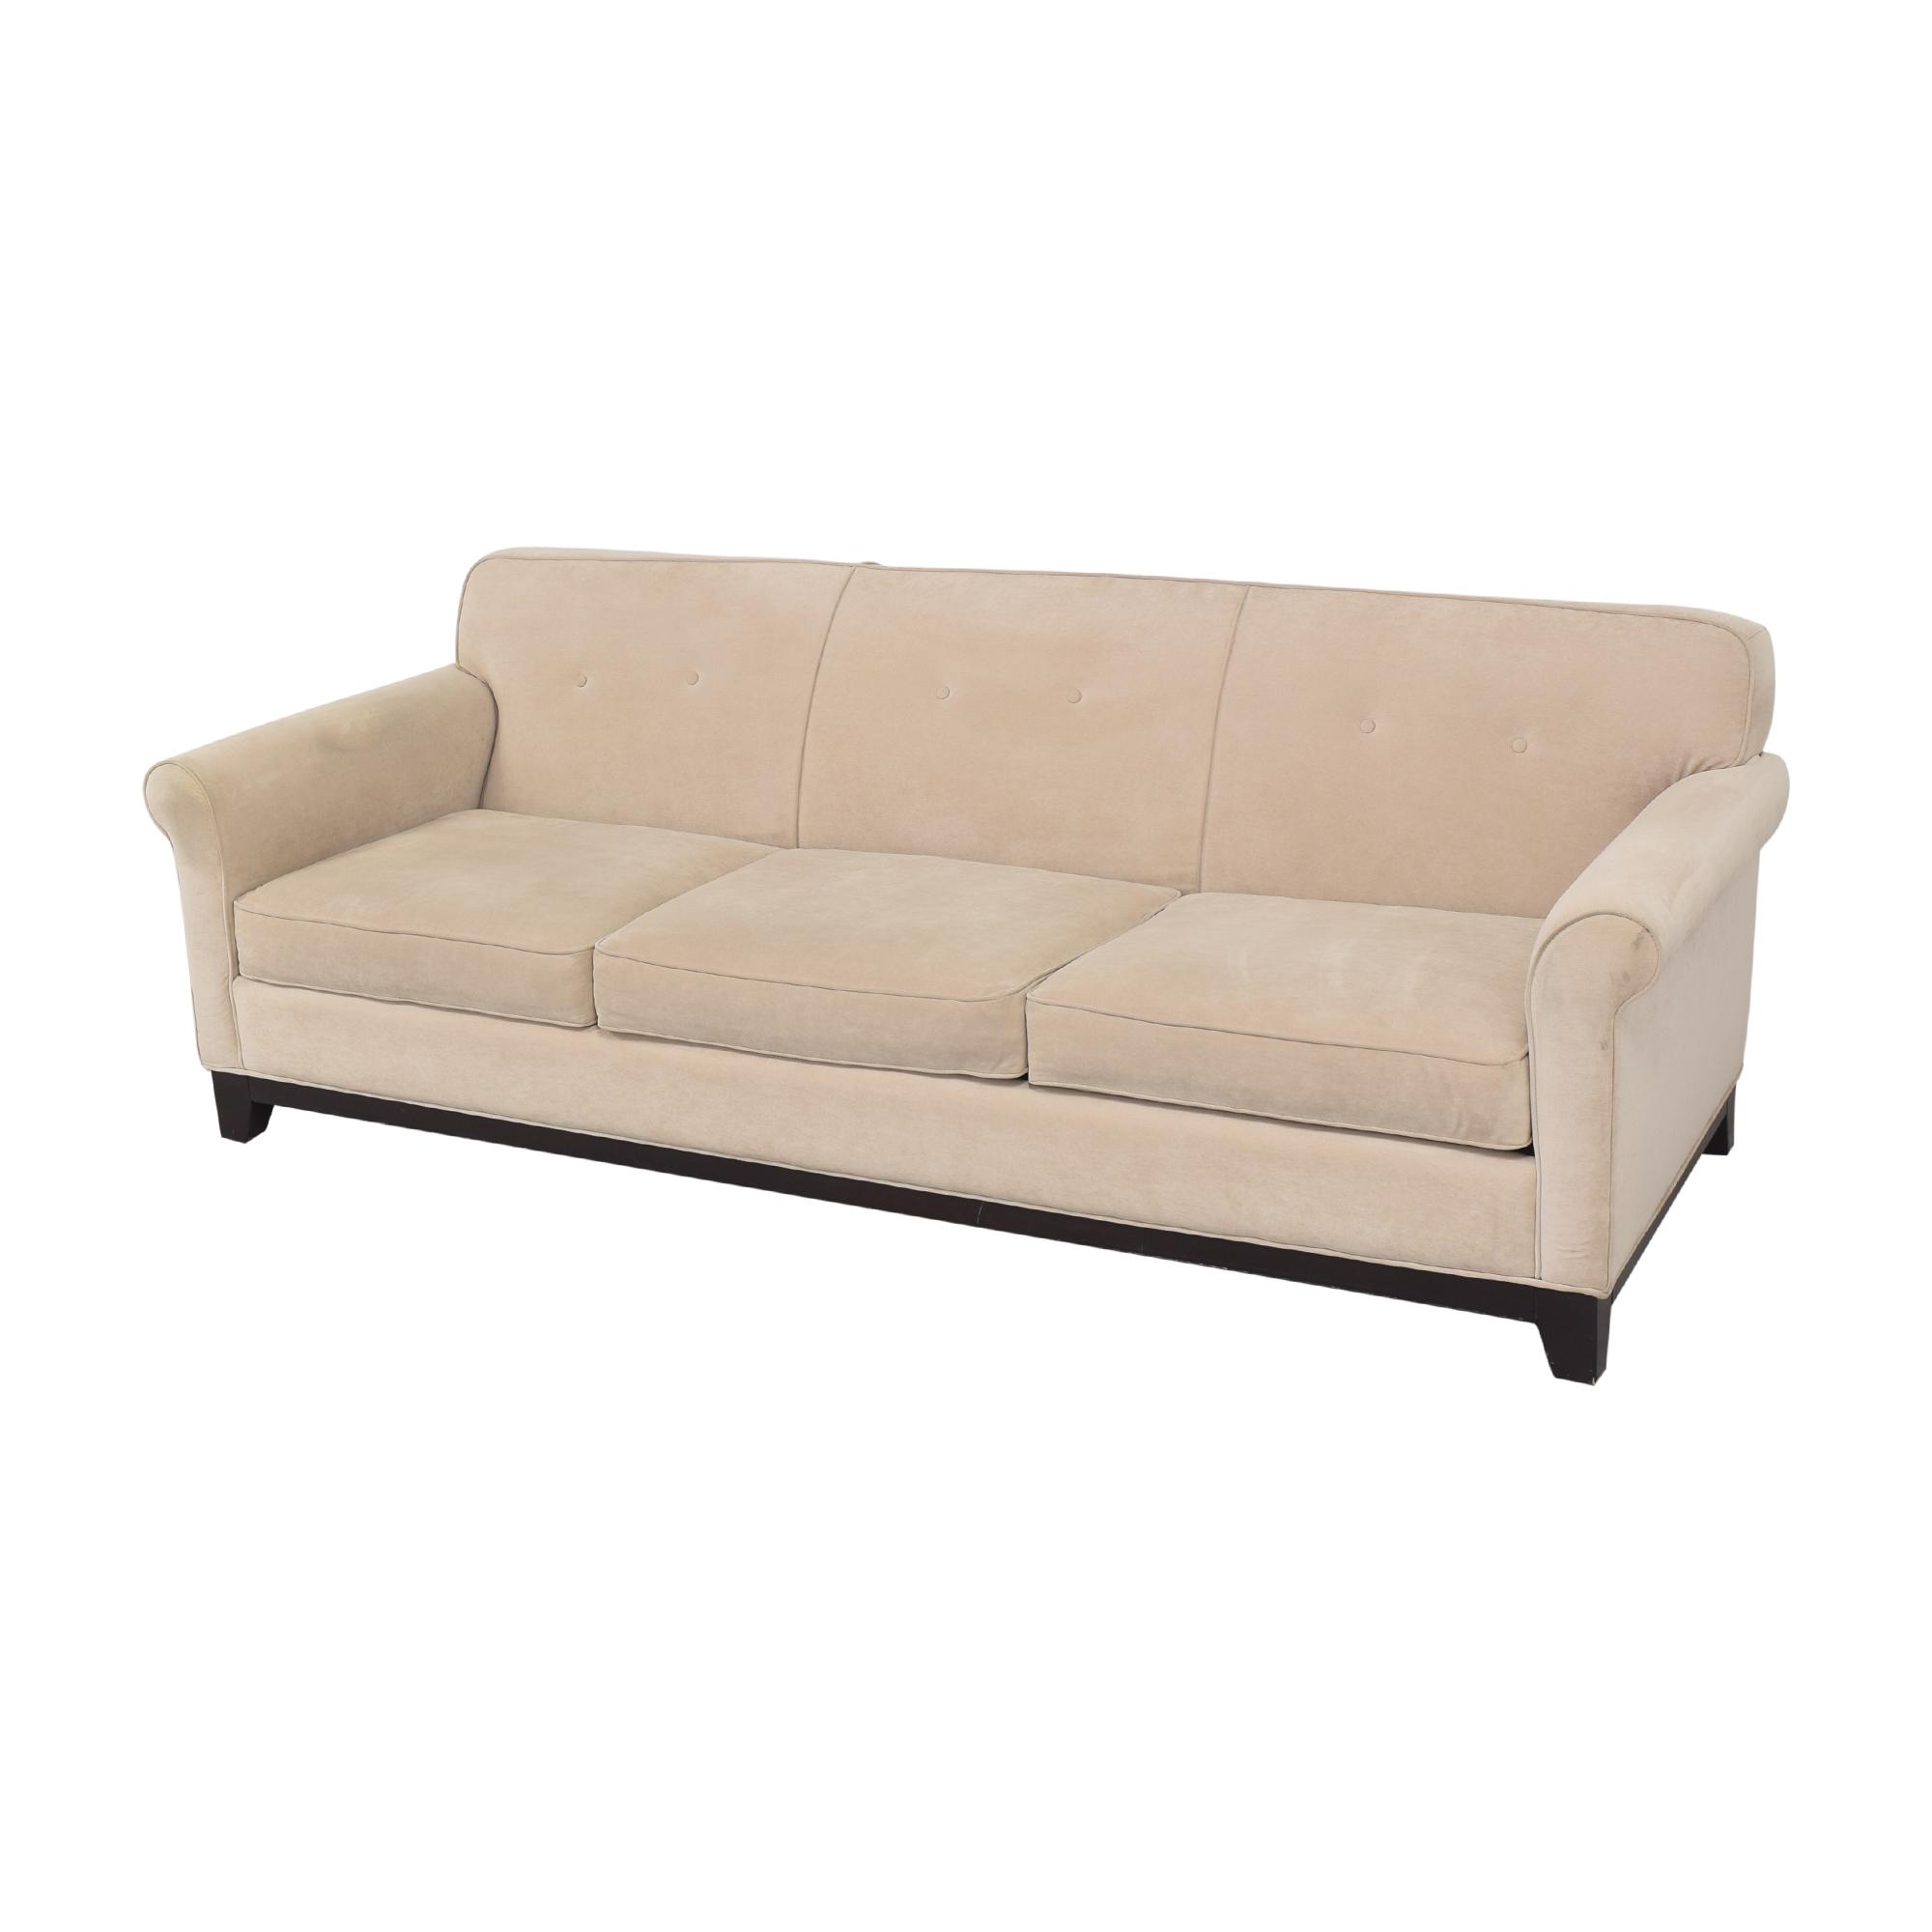 shop  Three Cushion Roll Arm Sofa online